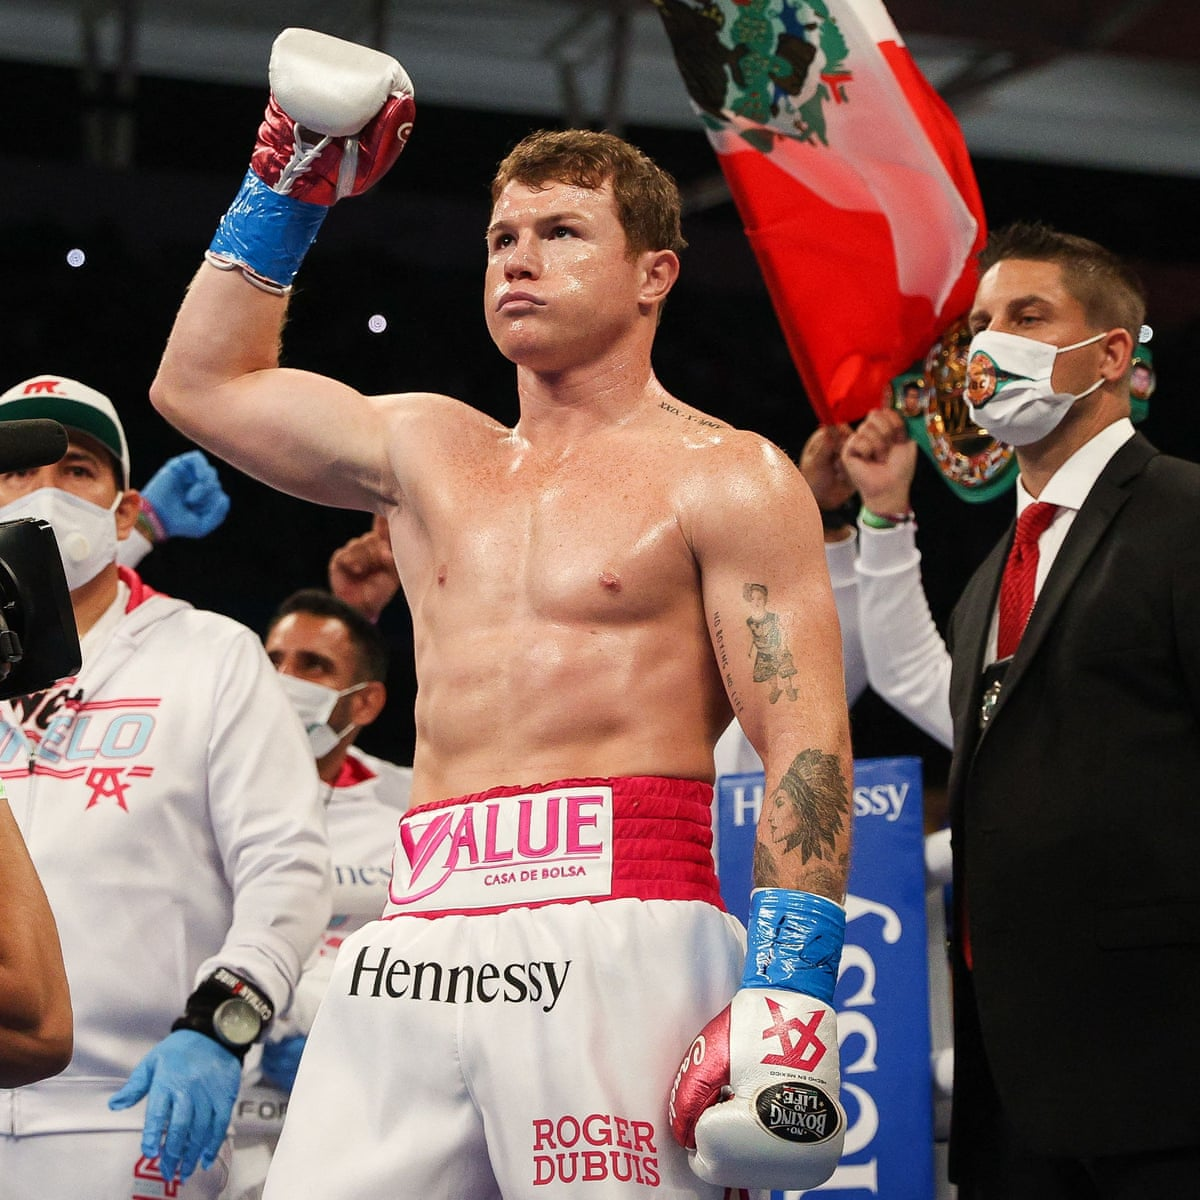 Canelo Álvarez defends super middleweight titles after Avni Yıldırım  retires on stool – as it happened | Sport | The Guardian